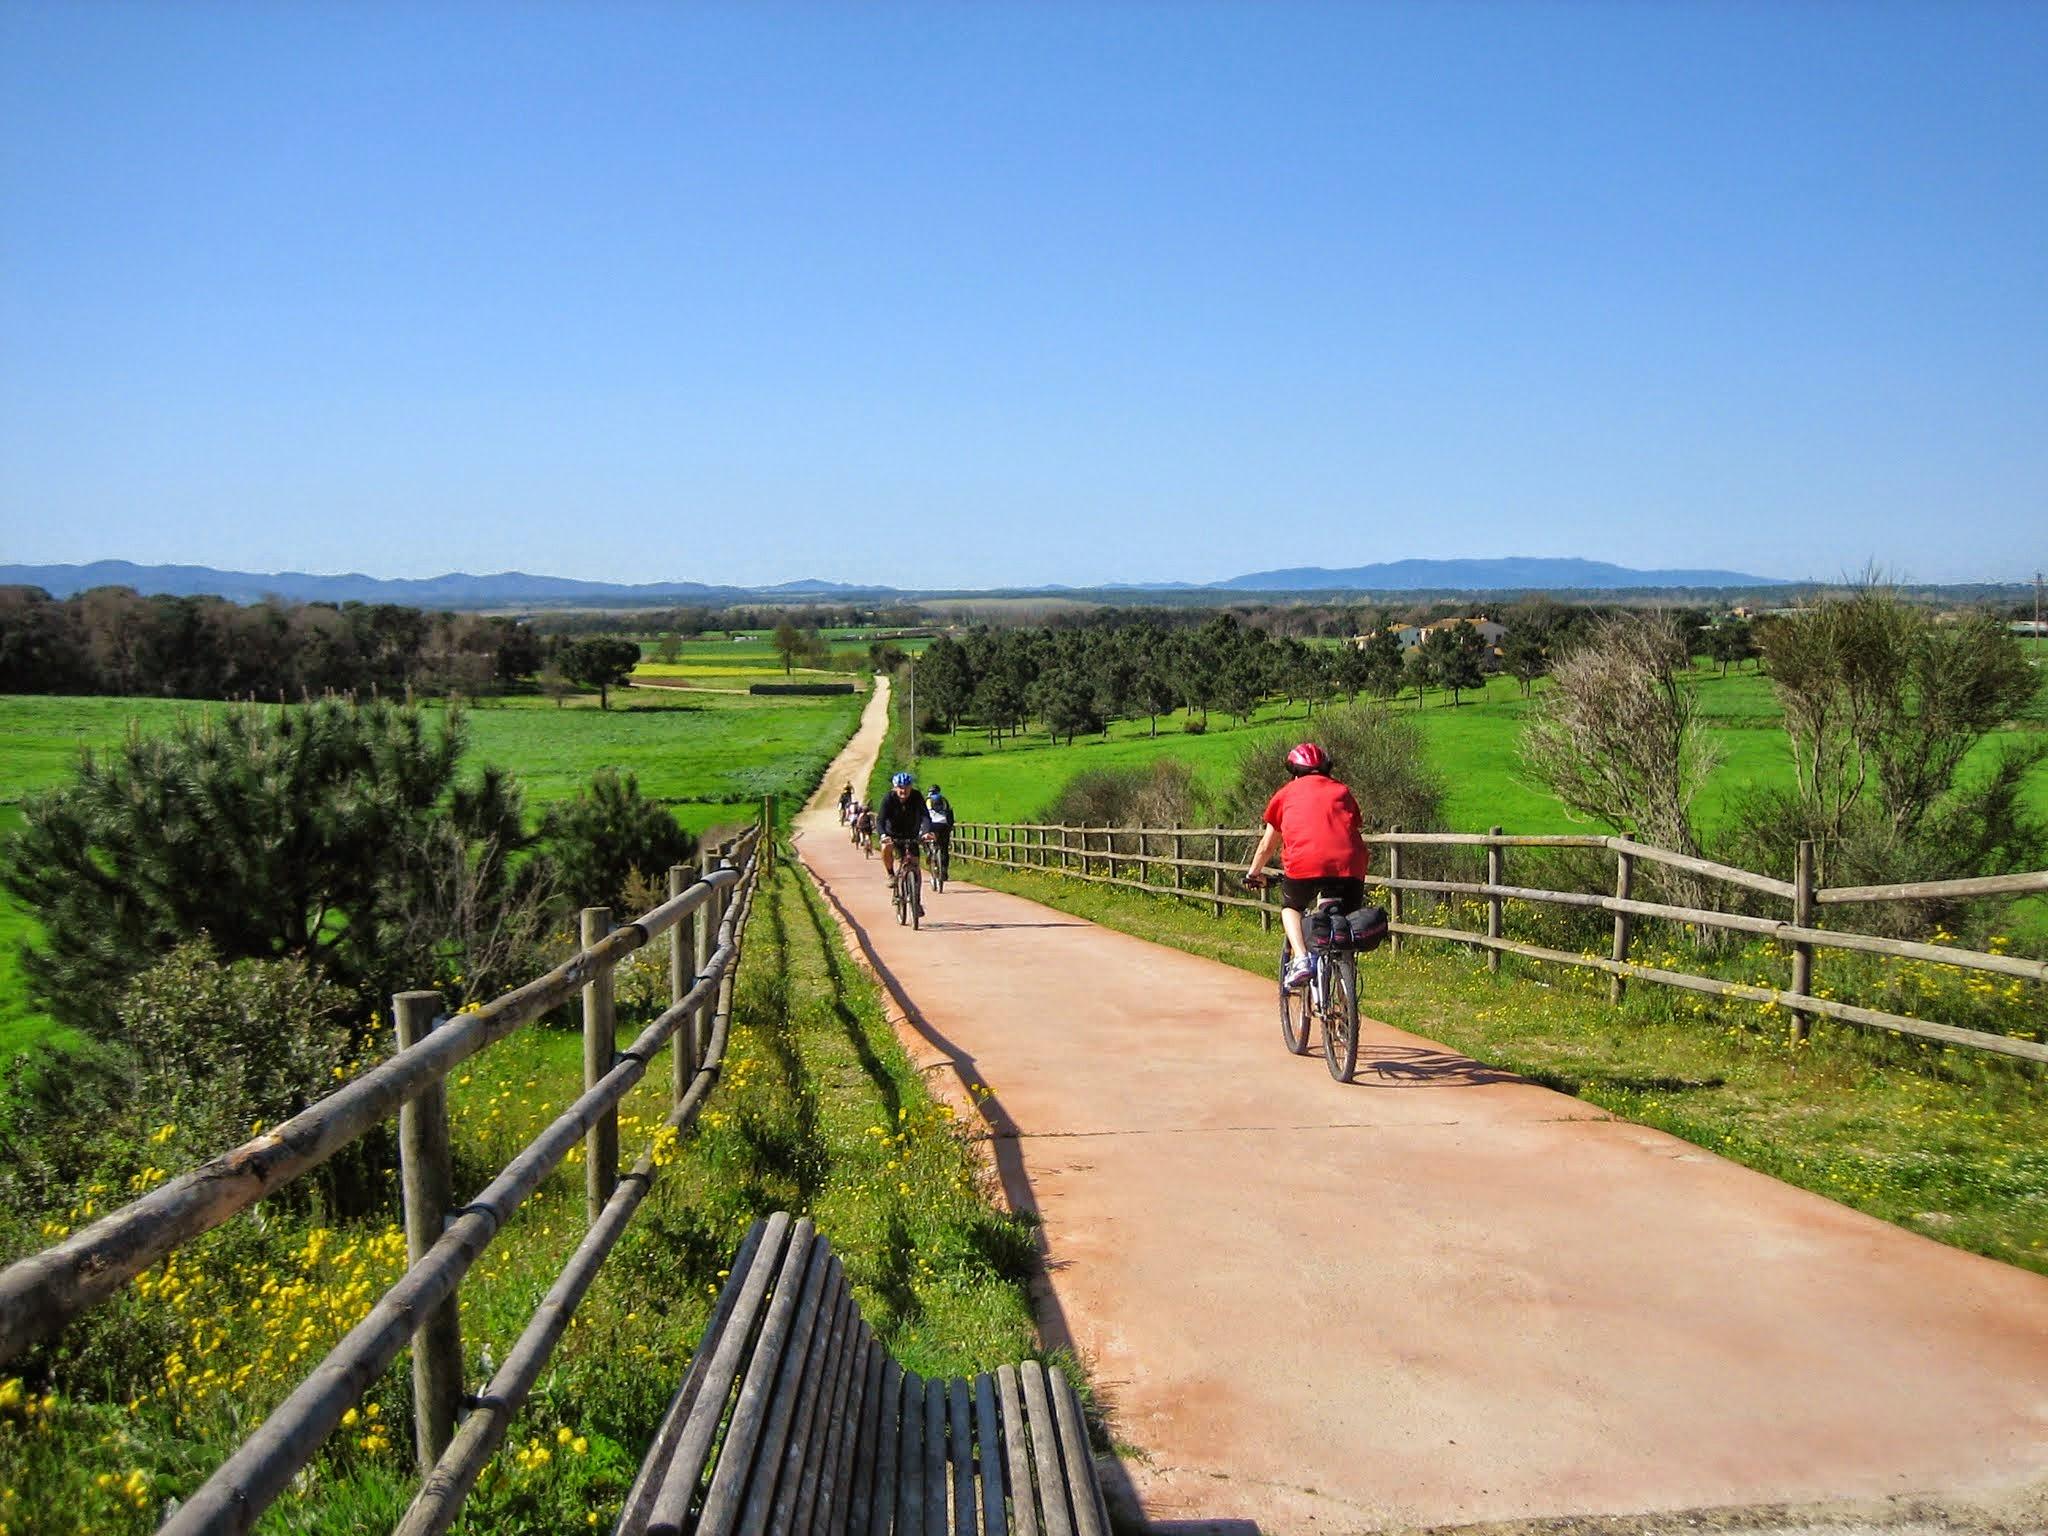 Via Verda del Carrilet II: Girona - Sant Feliu de Guixols